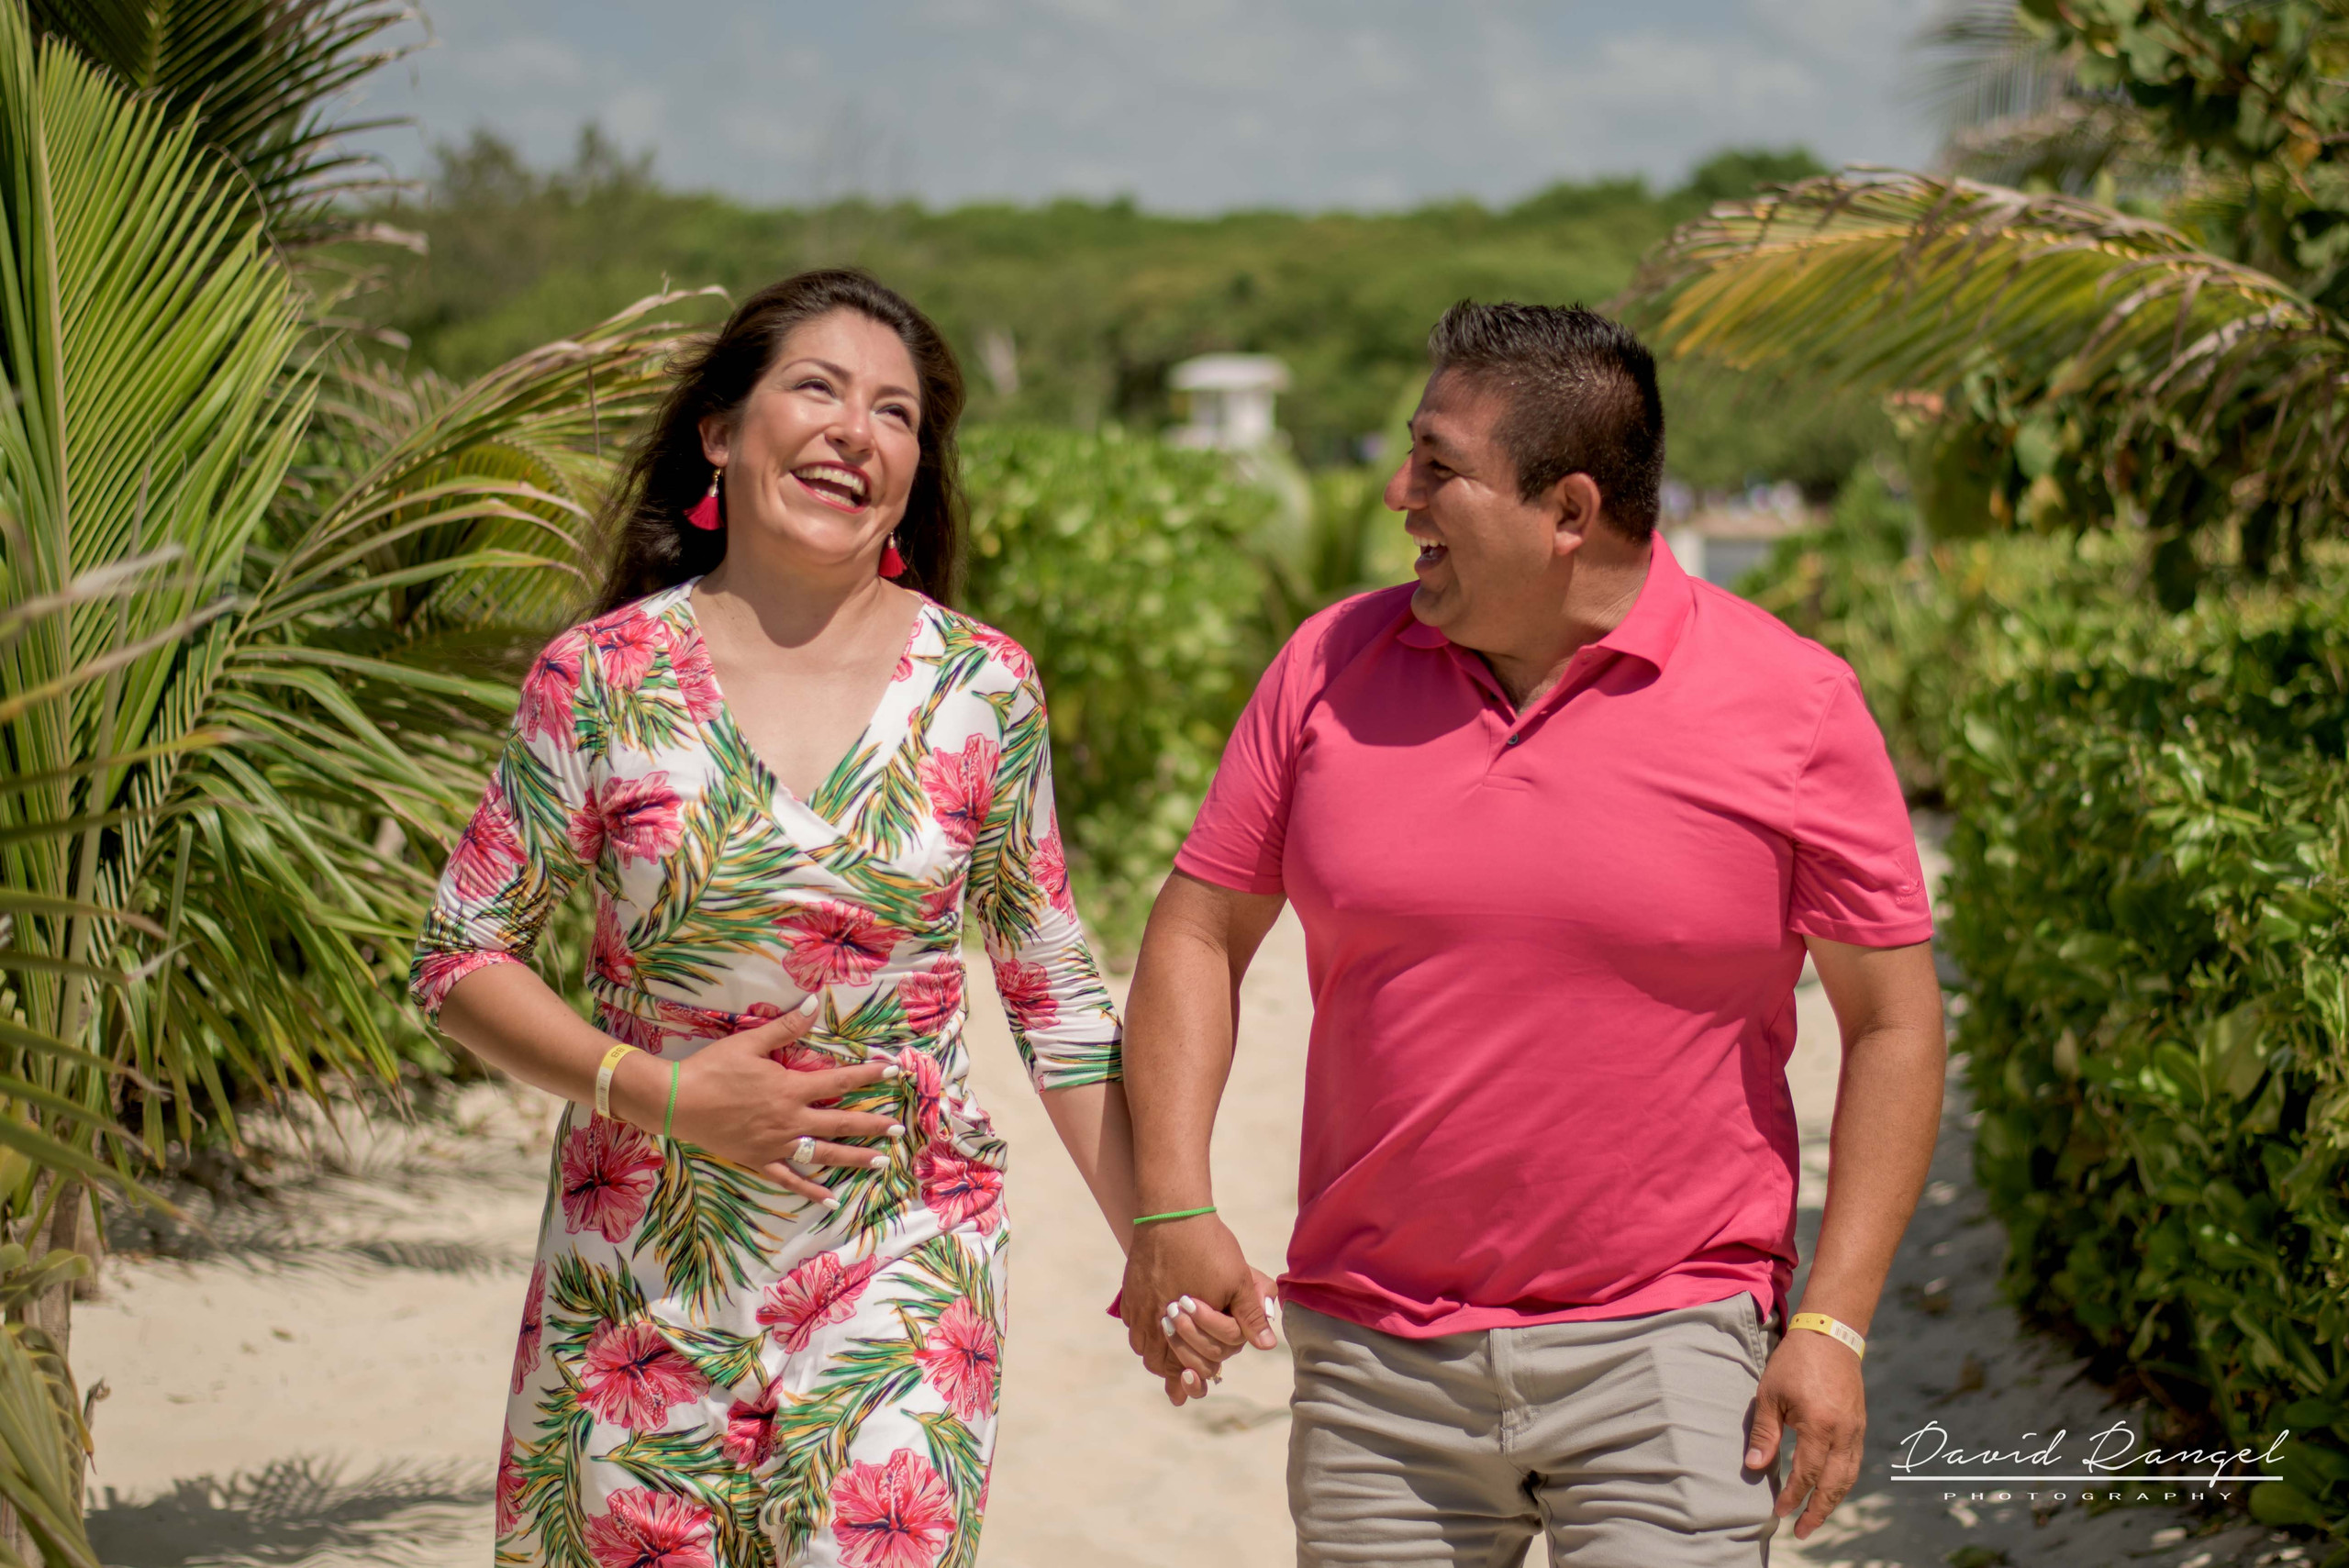 fotos+en+playa+del+carmen+cancun